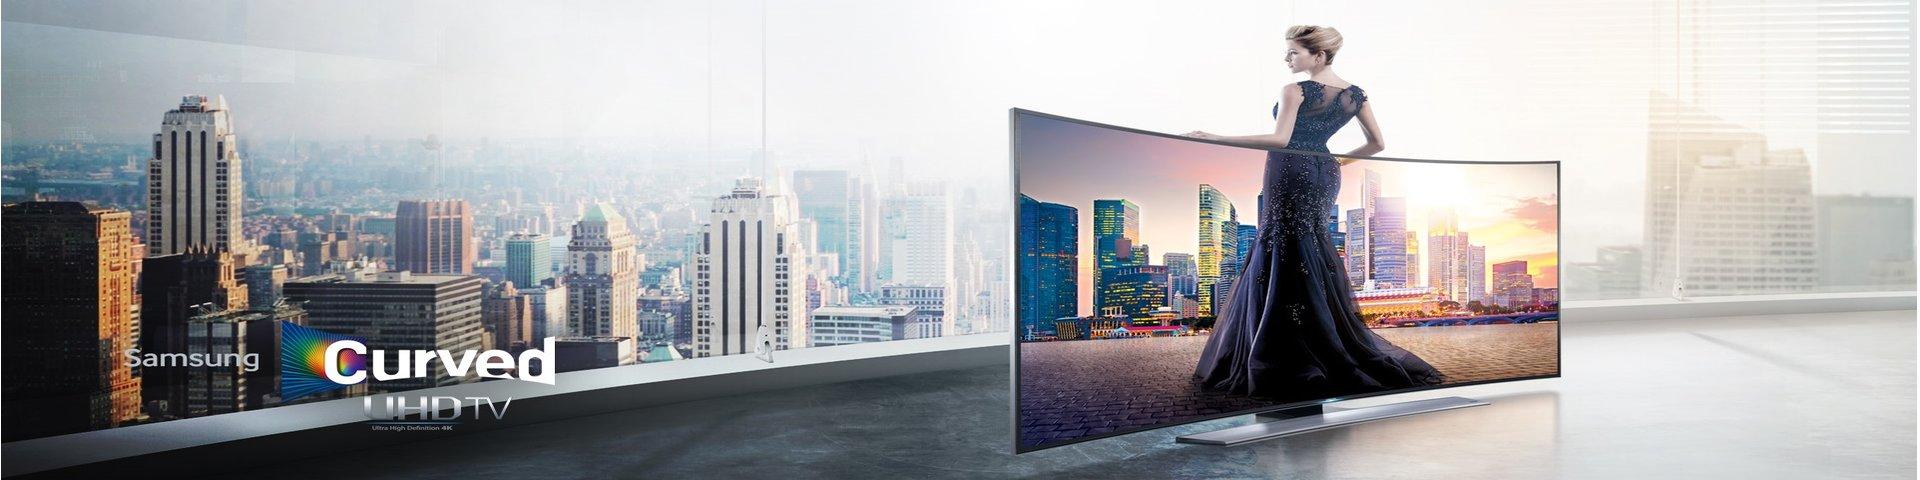 Samsung Curved UHDTV Sale!